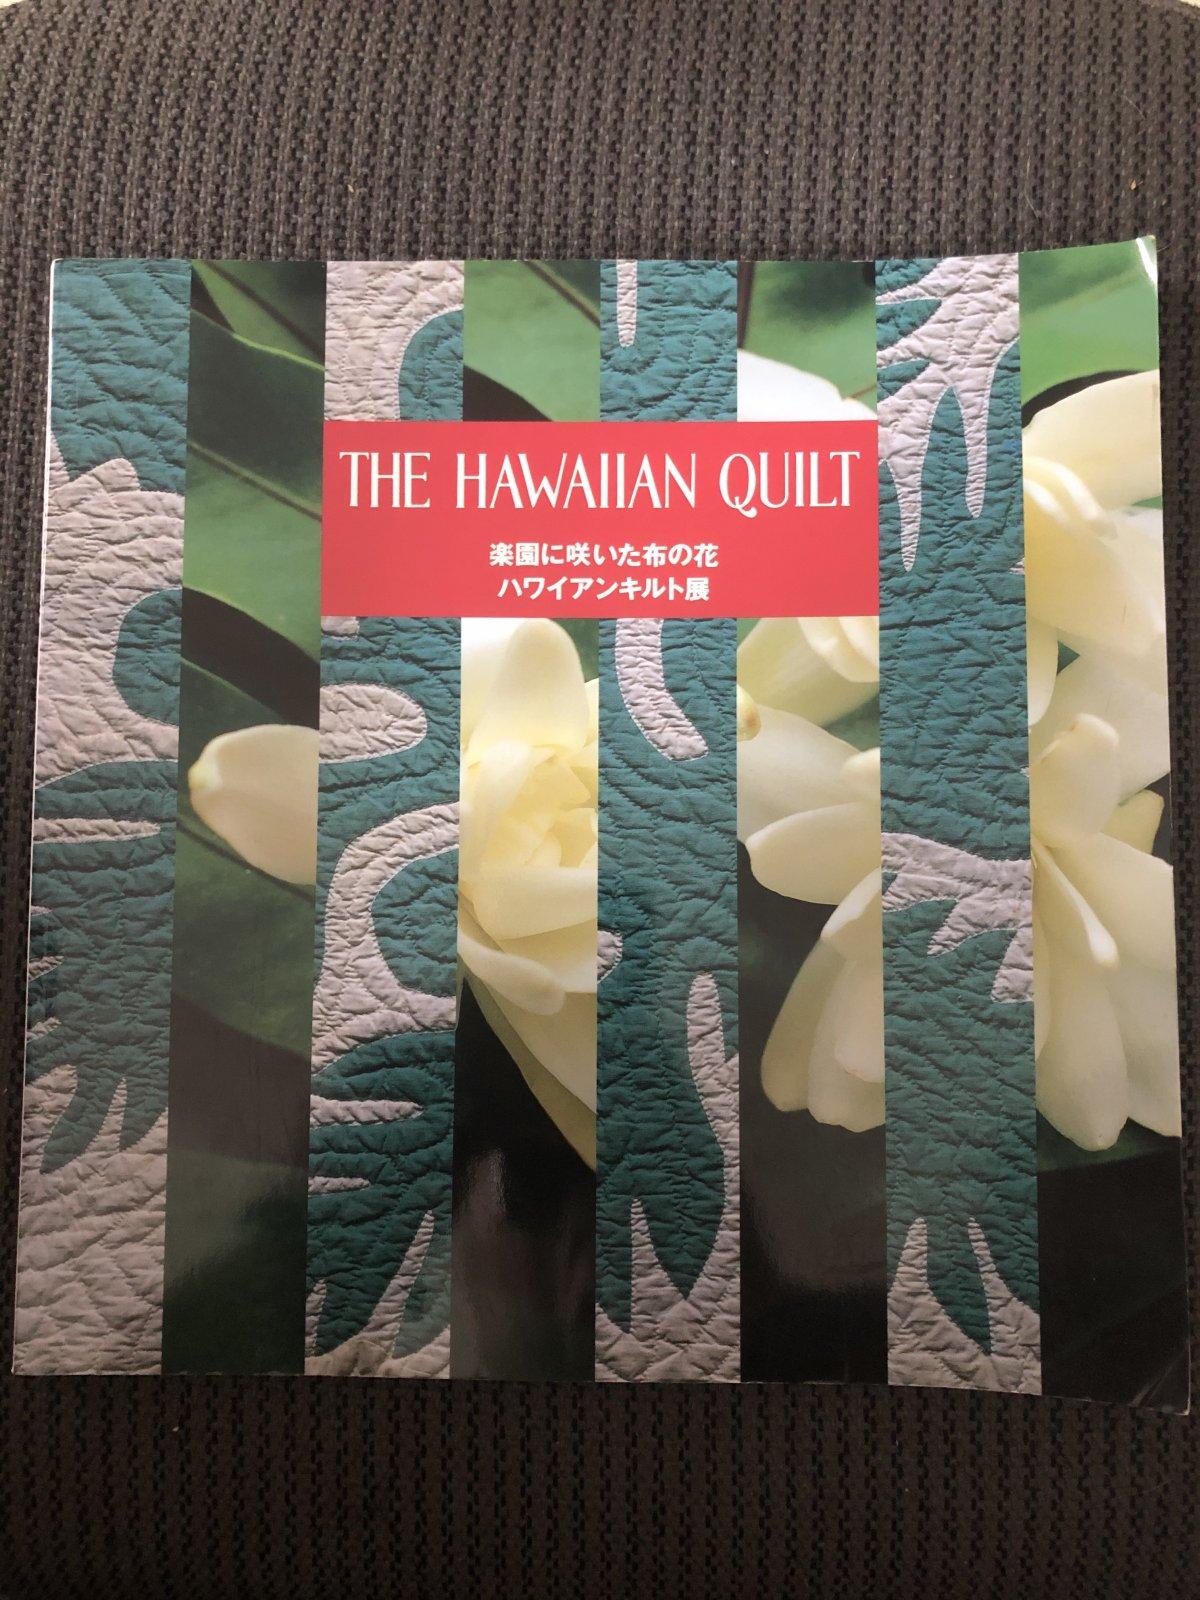 Hawaiian Quilt, The